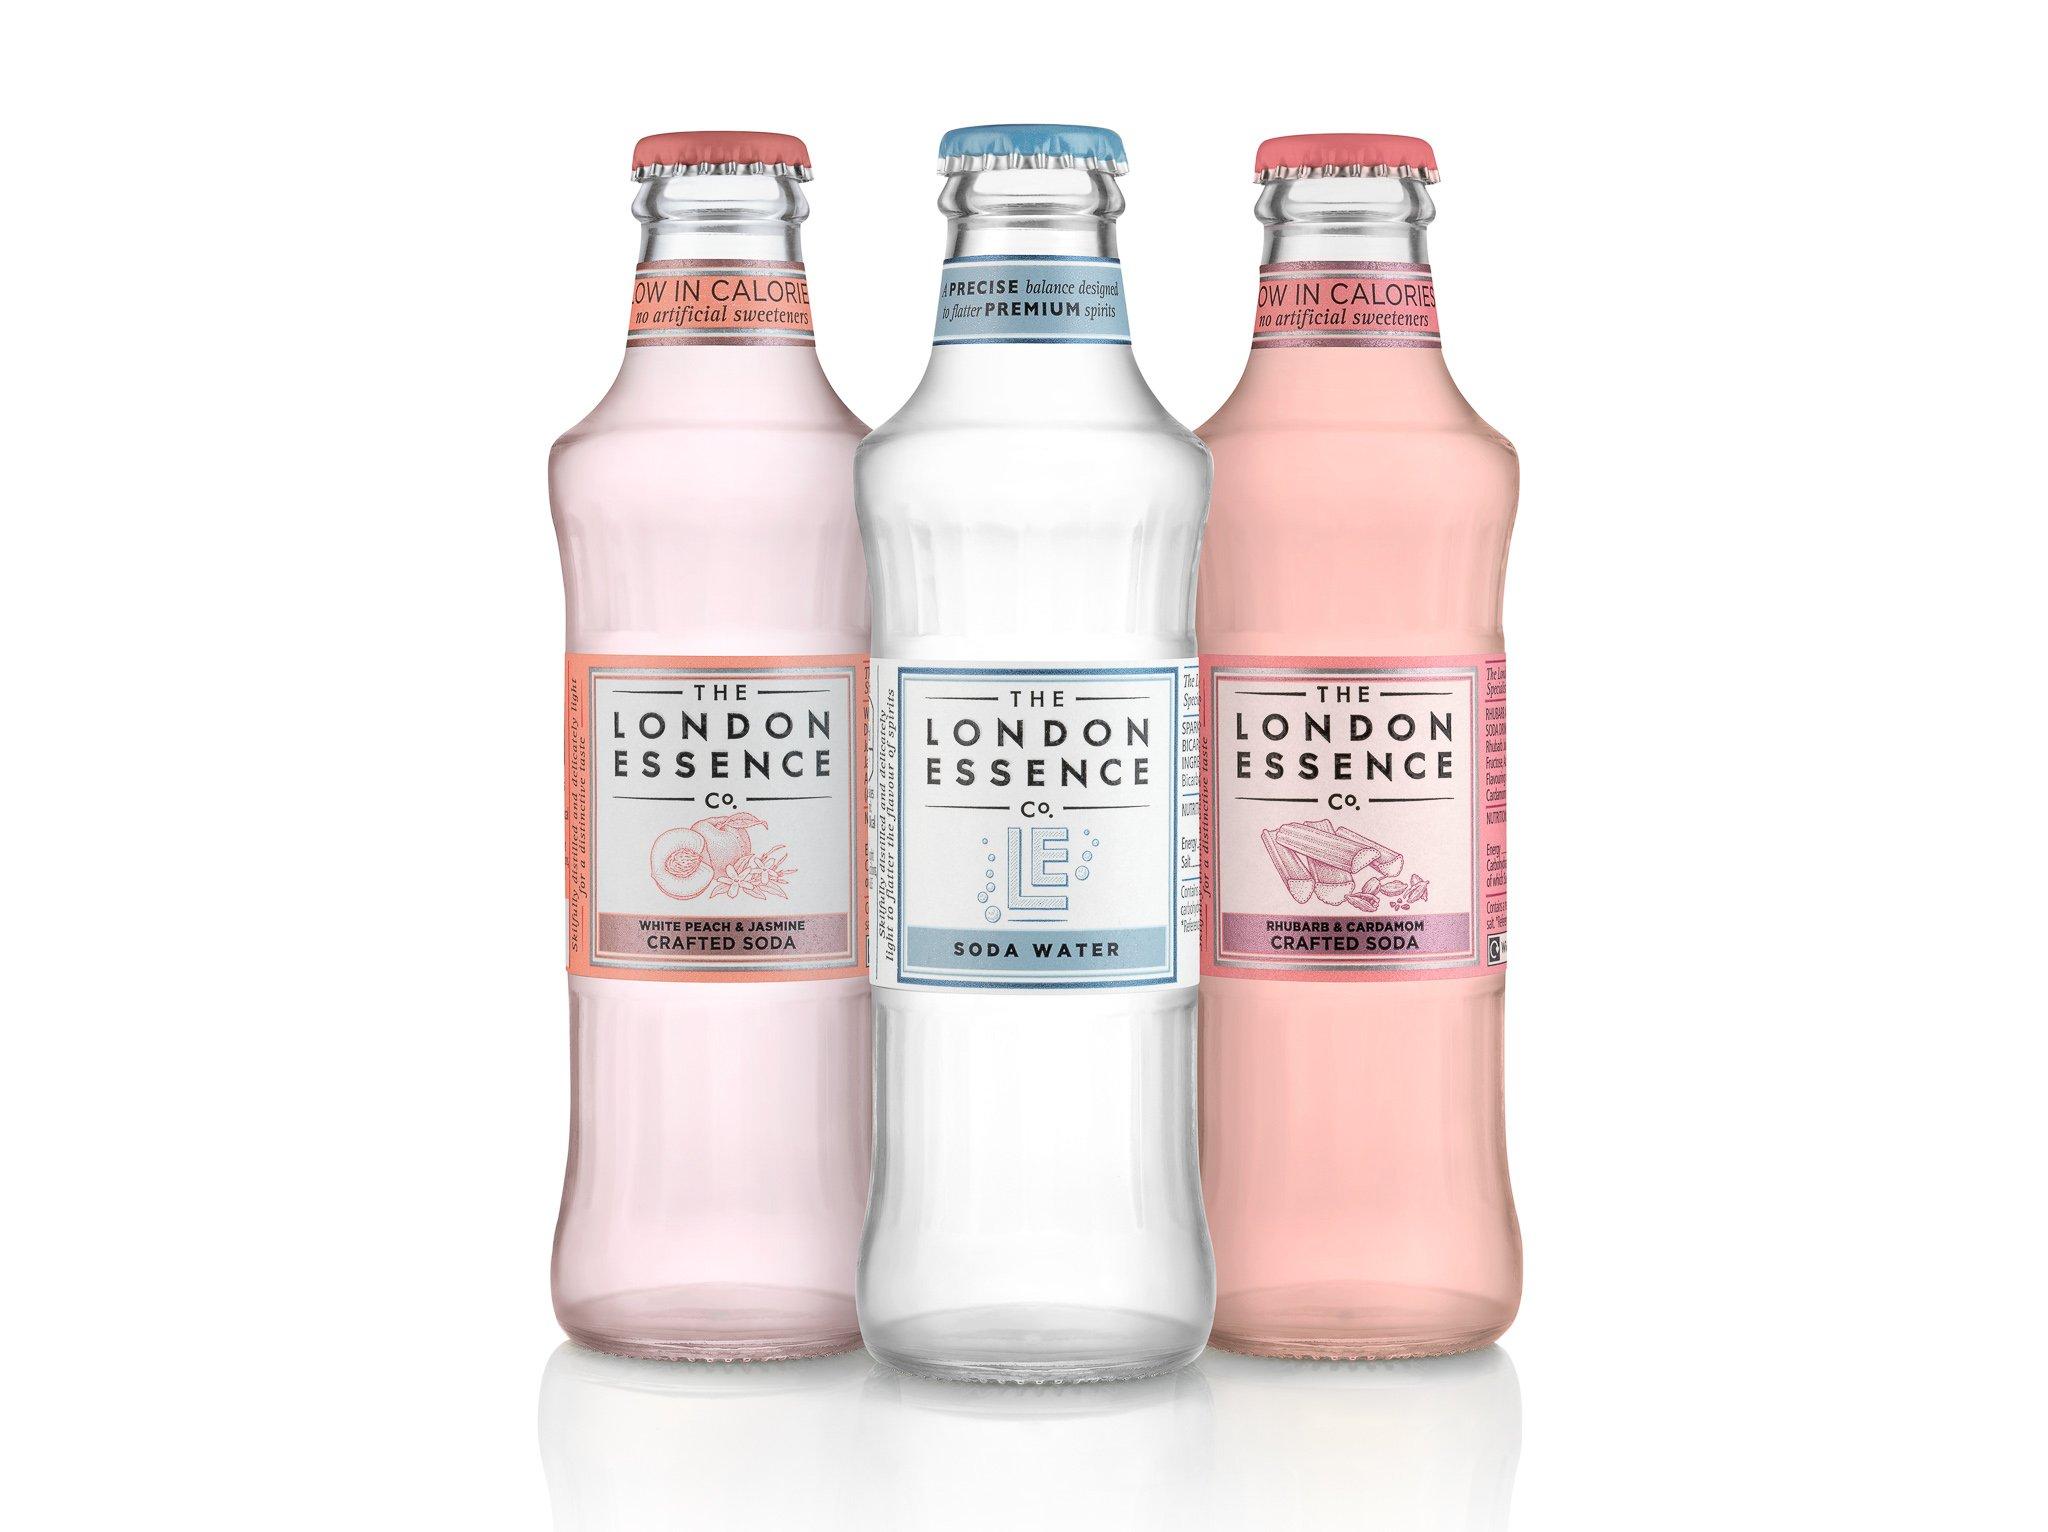 London Essence soda range, Alles over gin.